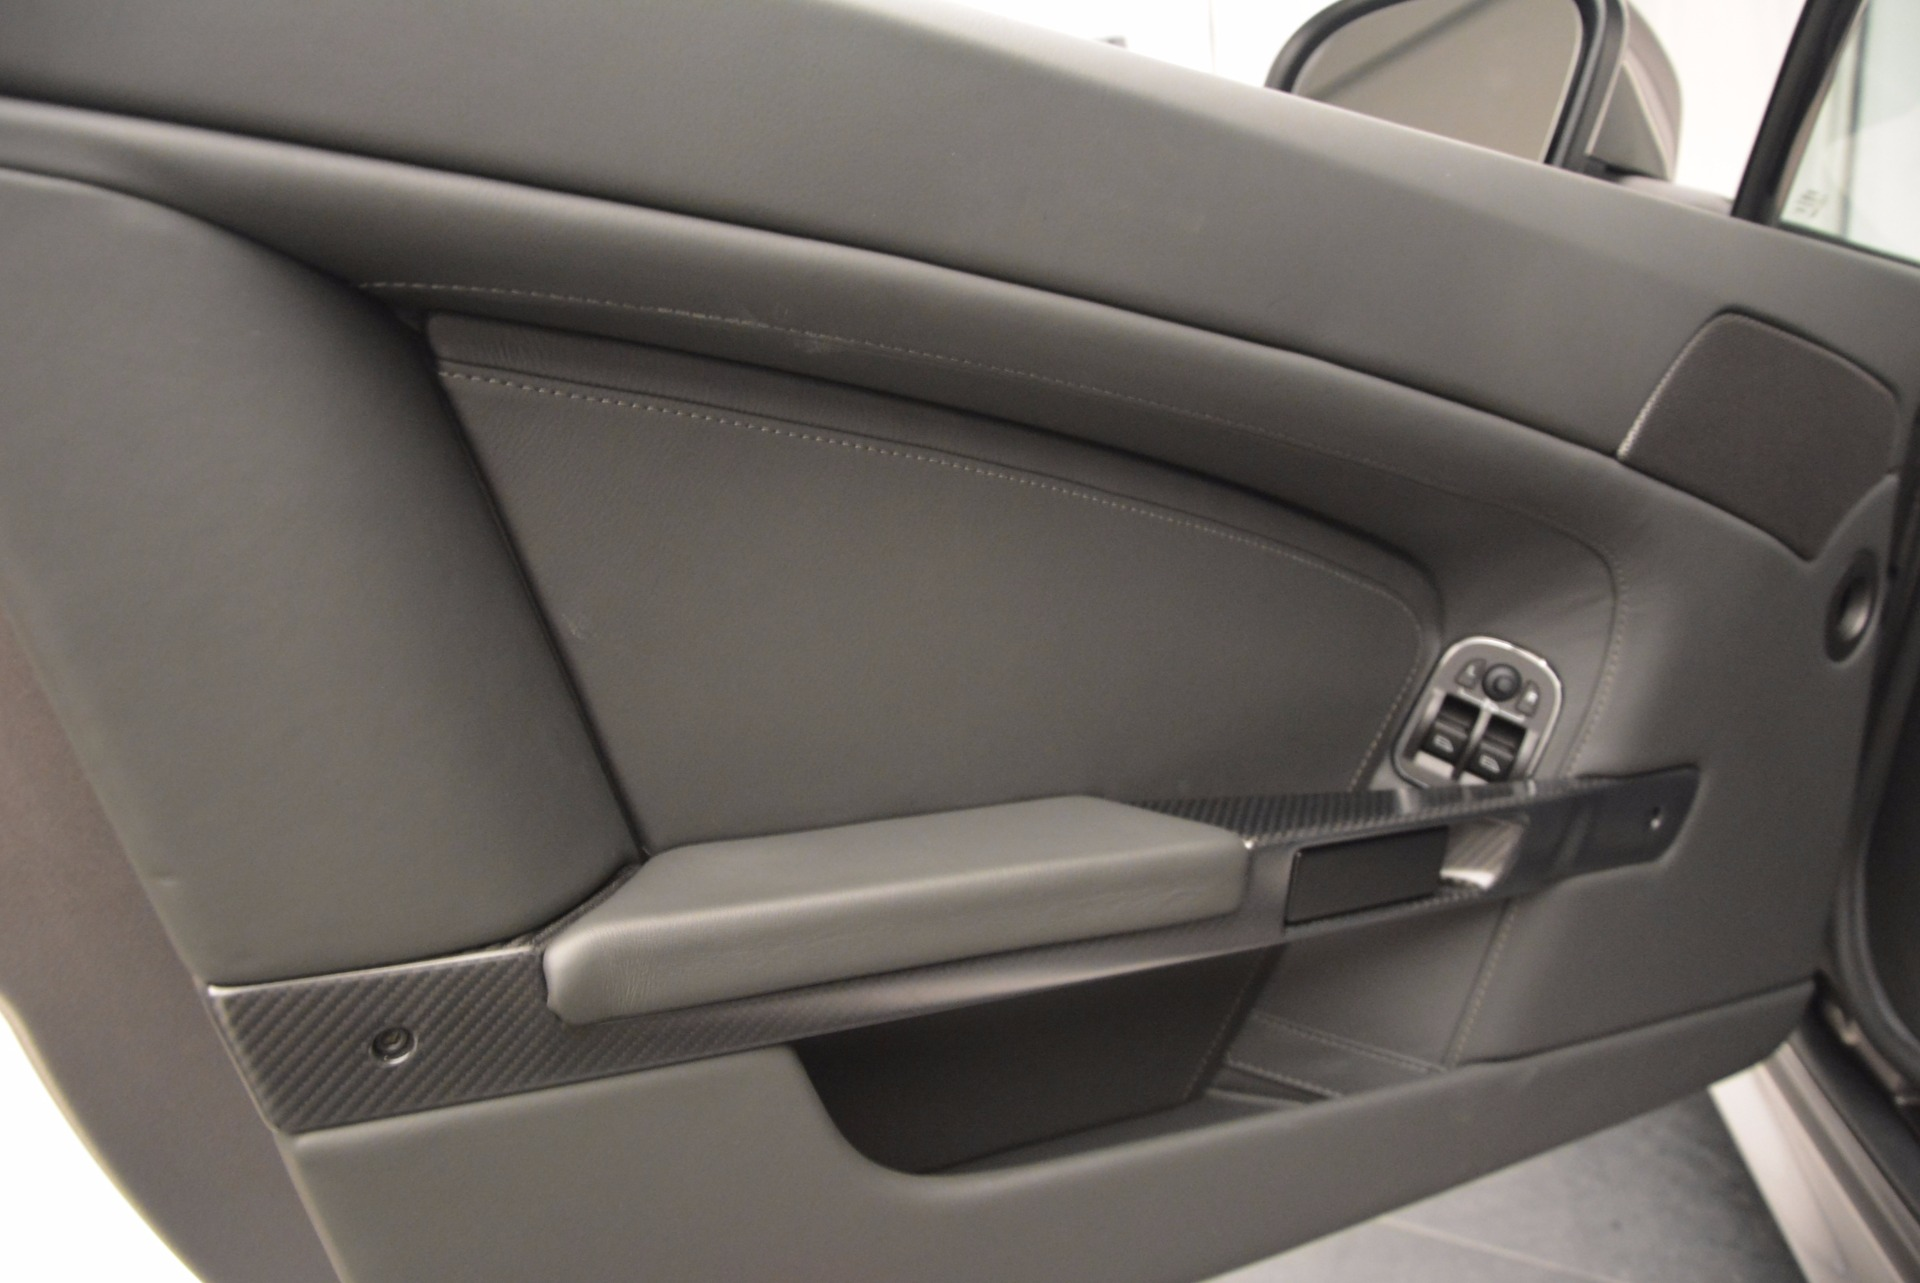 Used 2012 Aston Martin V12 Vantage  For Sale In Greenwich, CT 994_p15